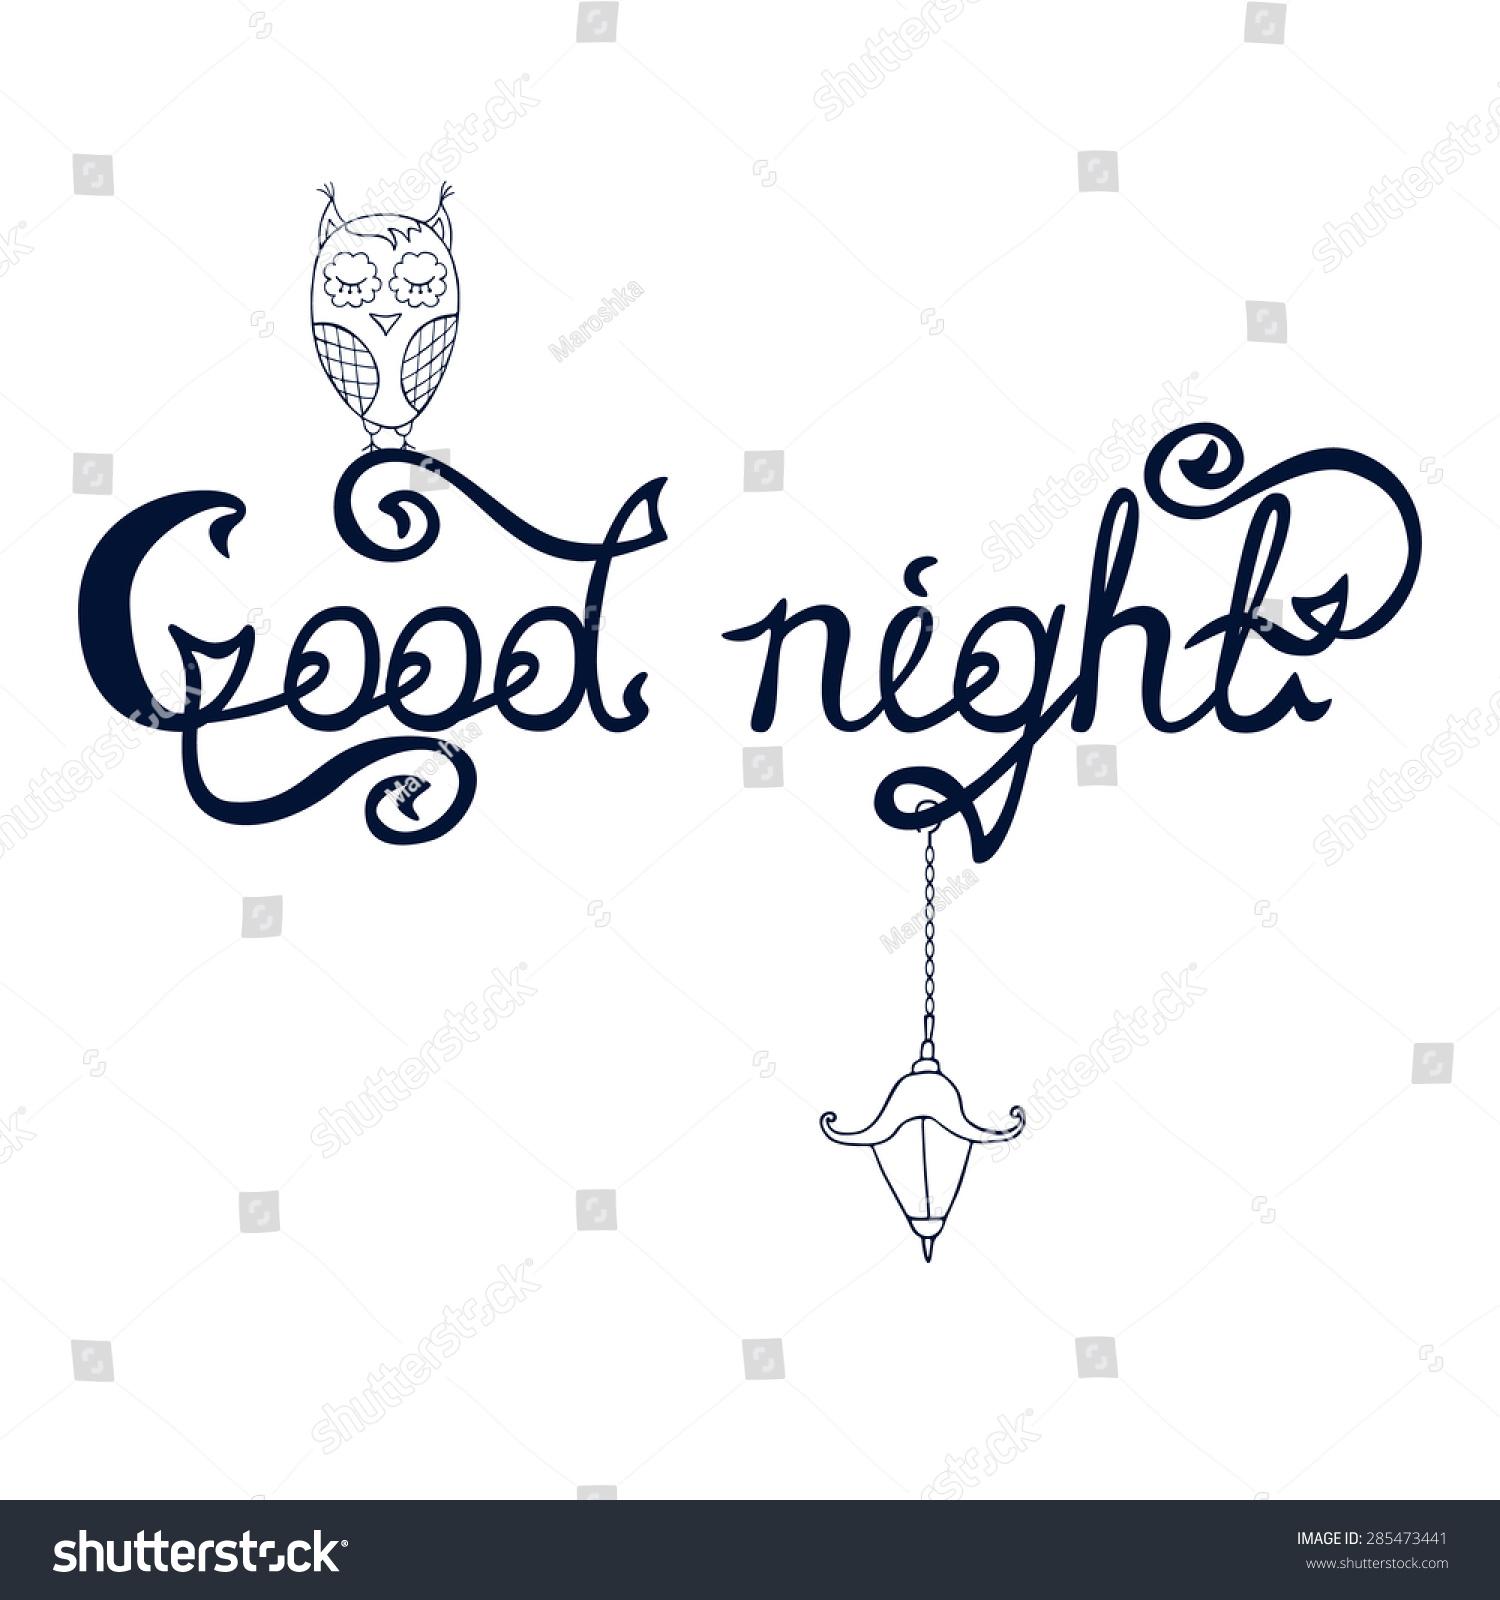 Good night word written in calligraphy style handwritten